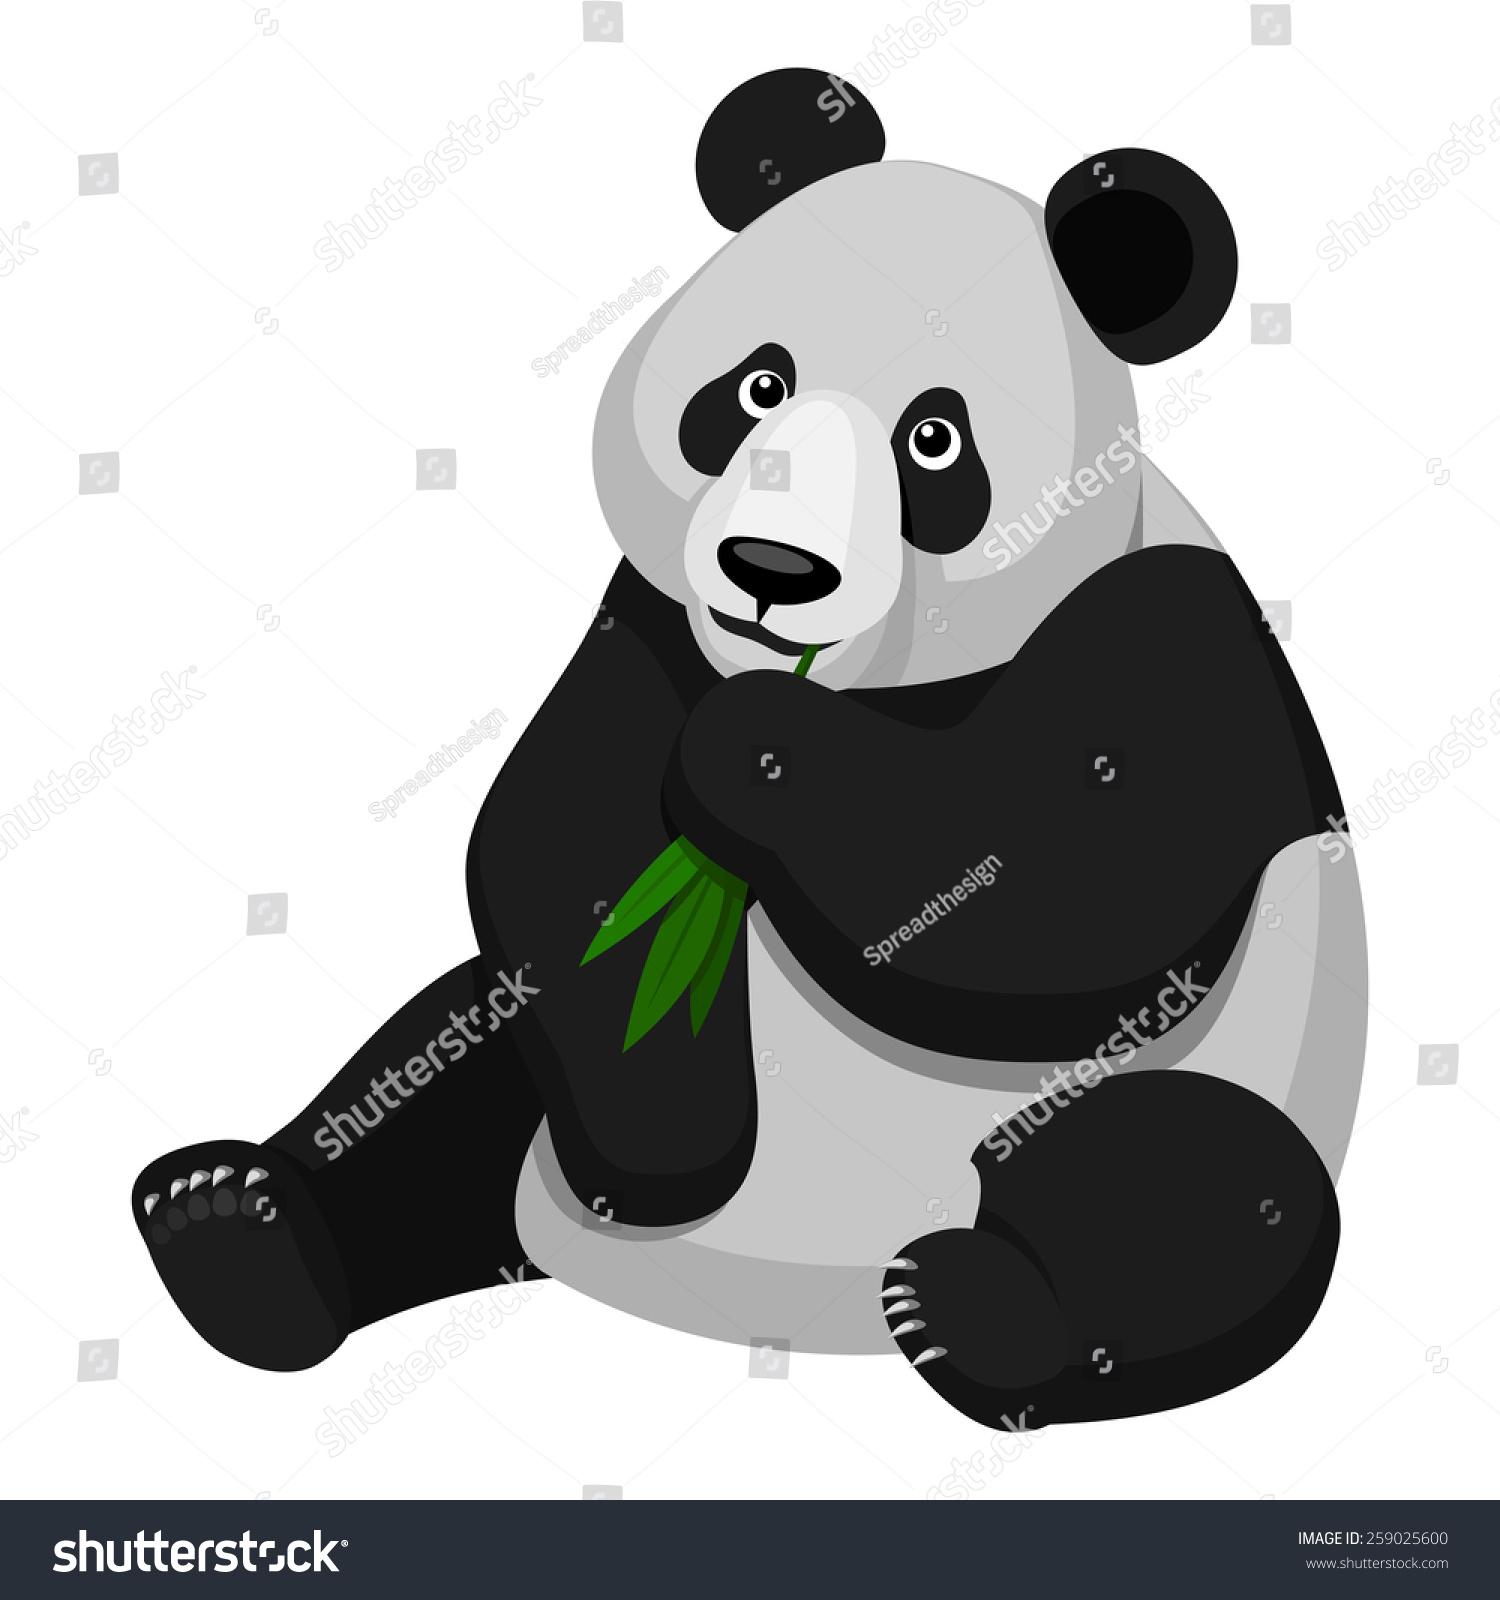 熊猫-动物/野生生物-海洛创意(hellorf)-shutterstock